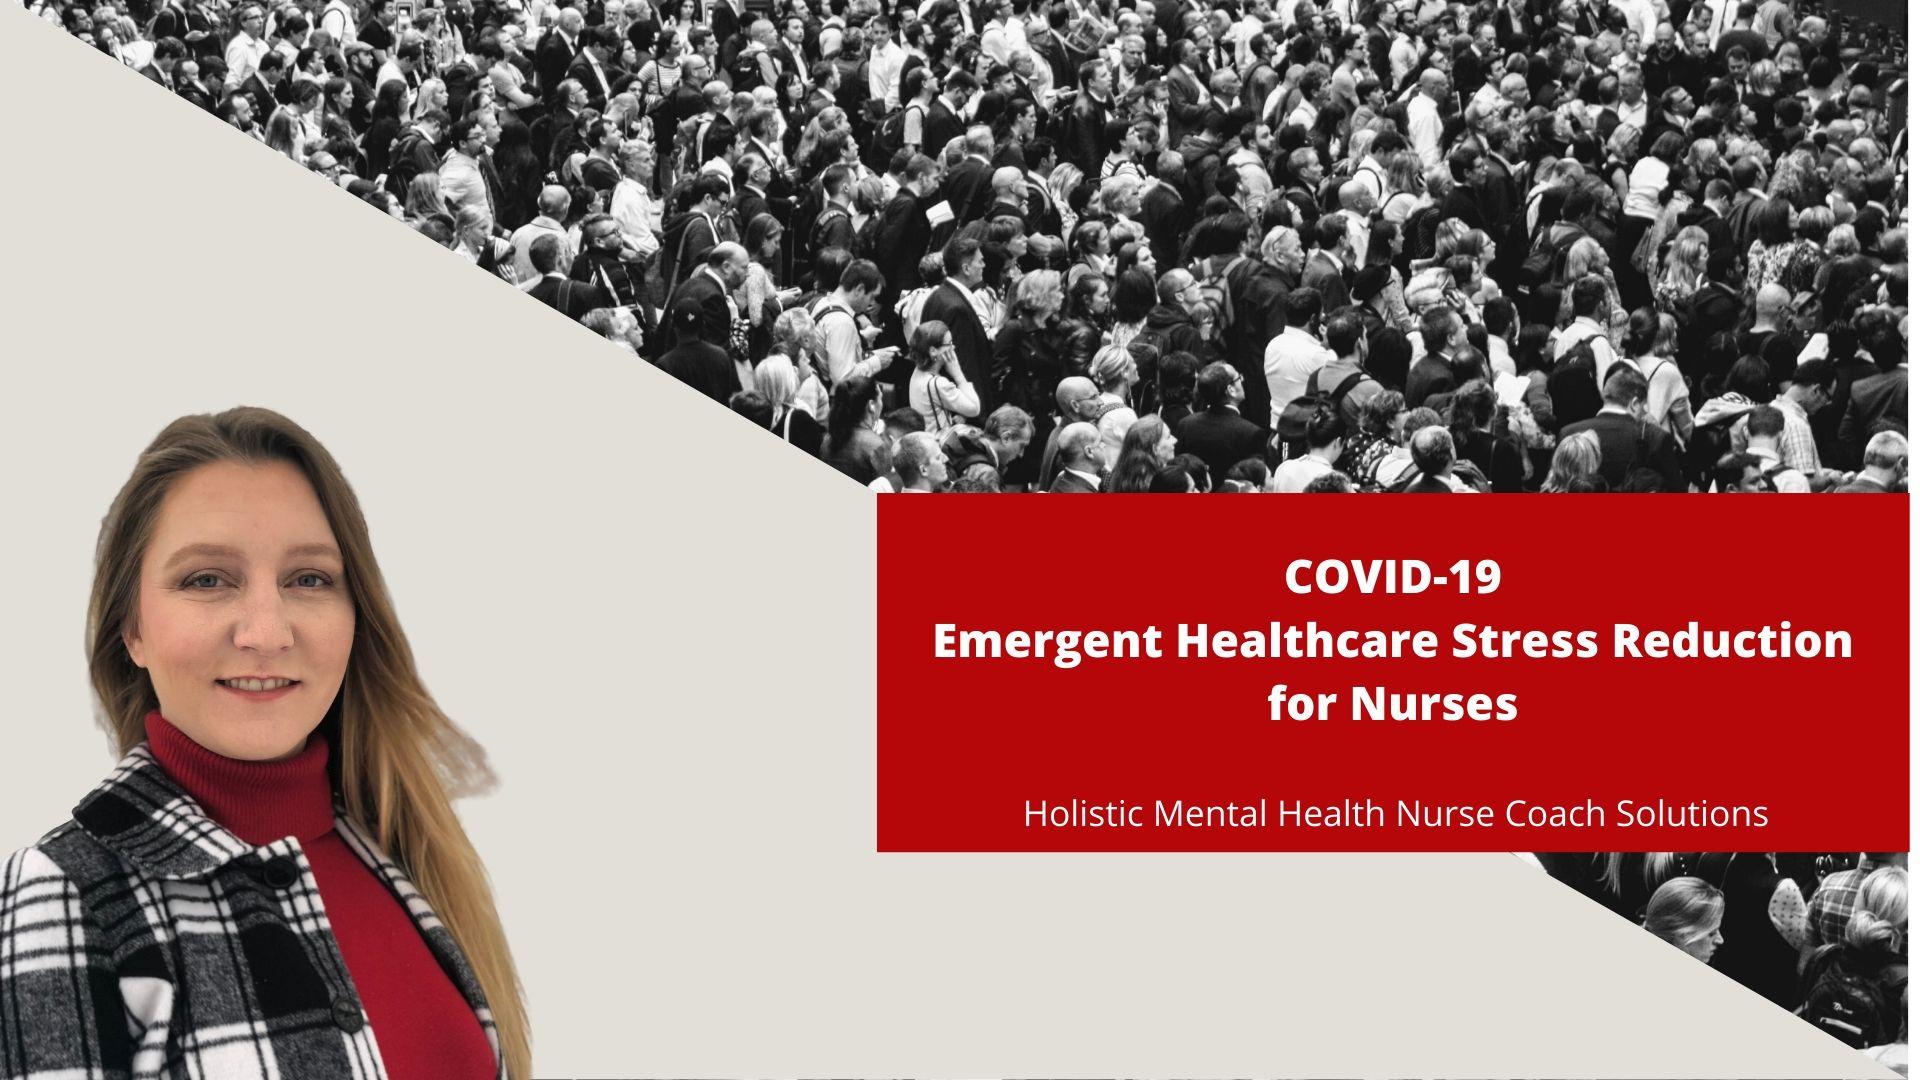 Elise Foreman Carter COVID-19 Emergent Healthcare Stress Reduction for Nurses